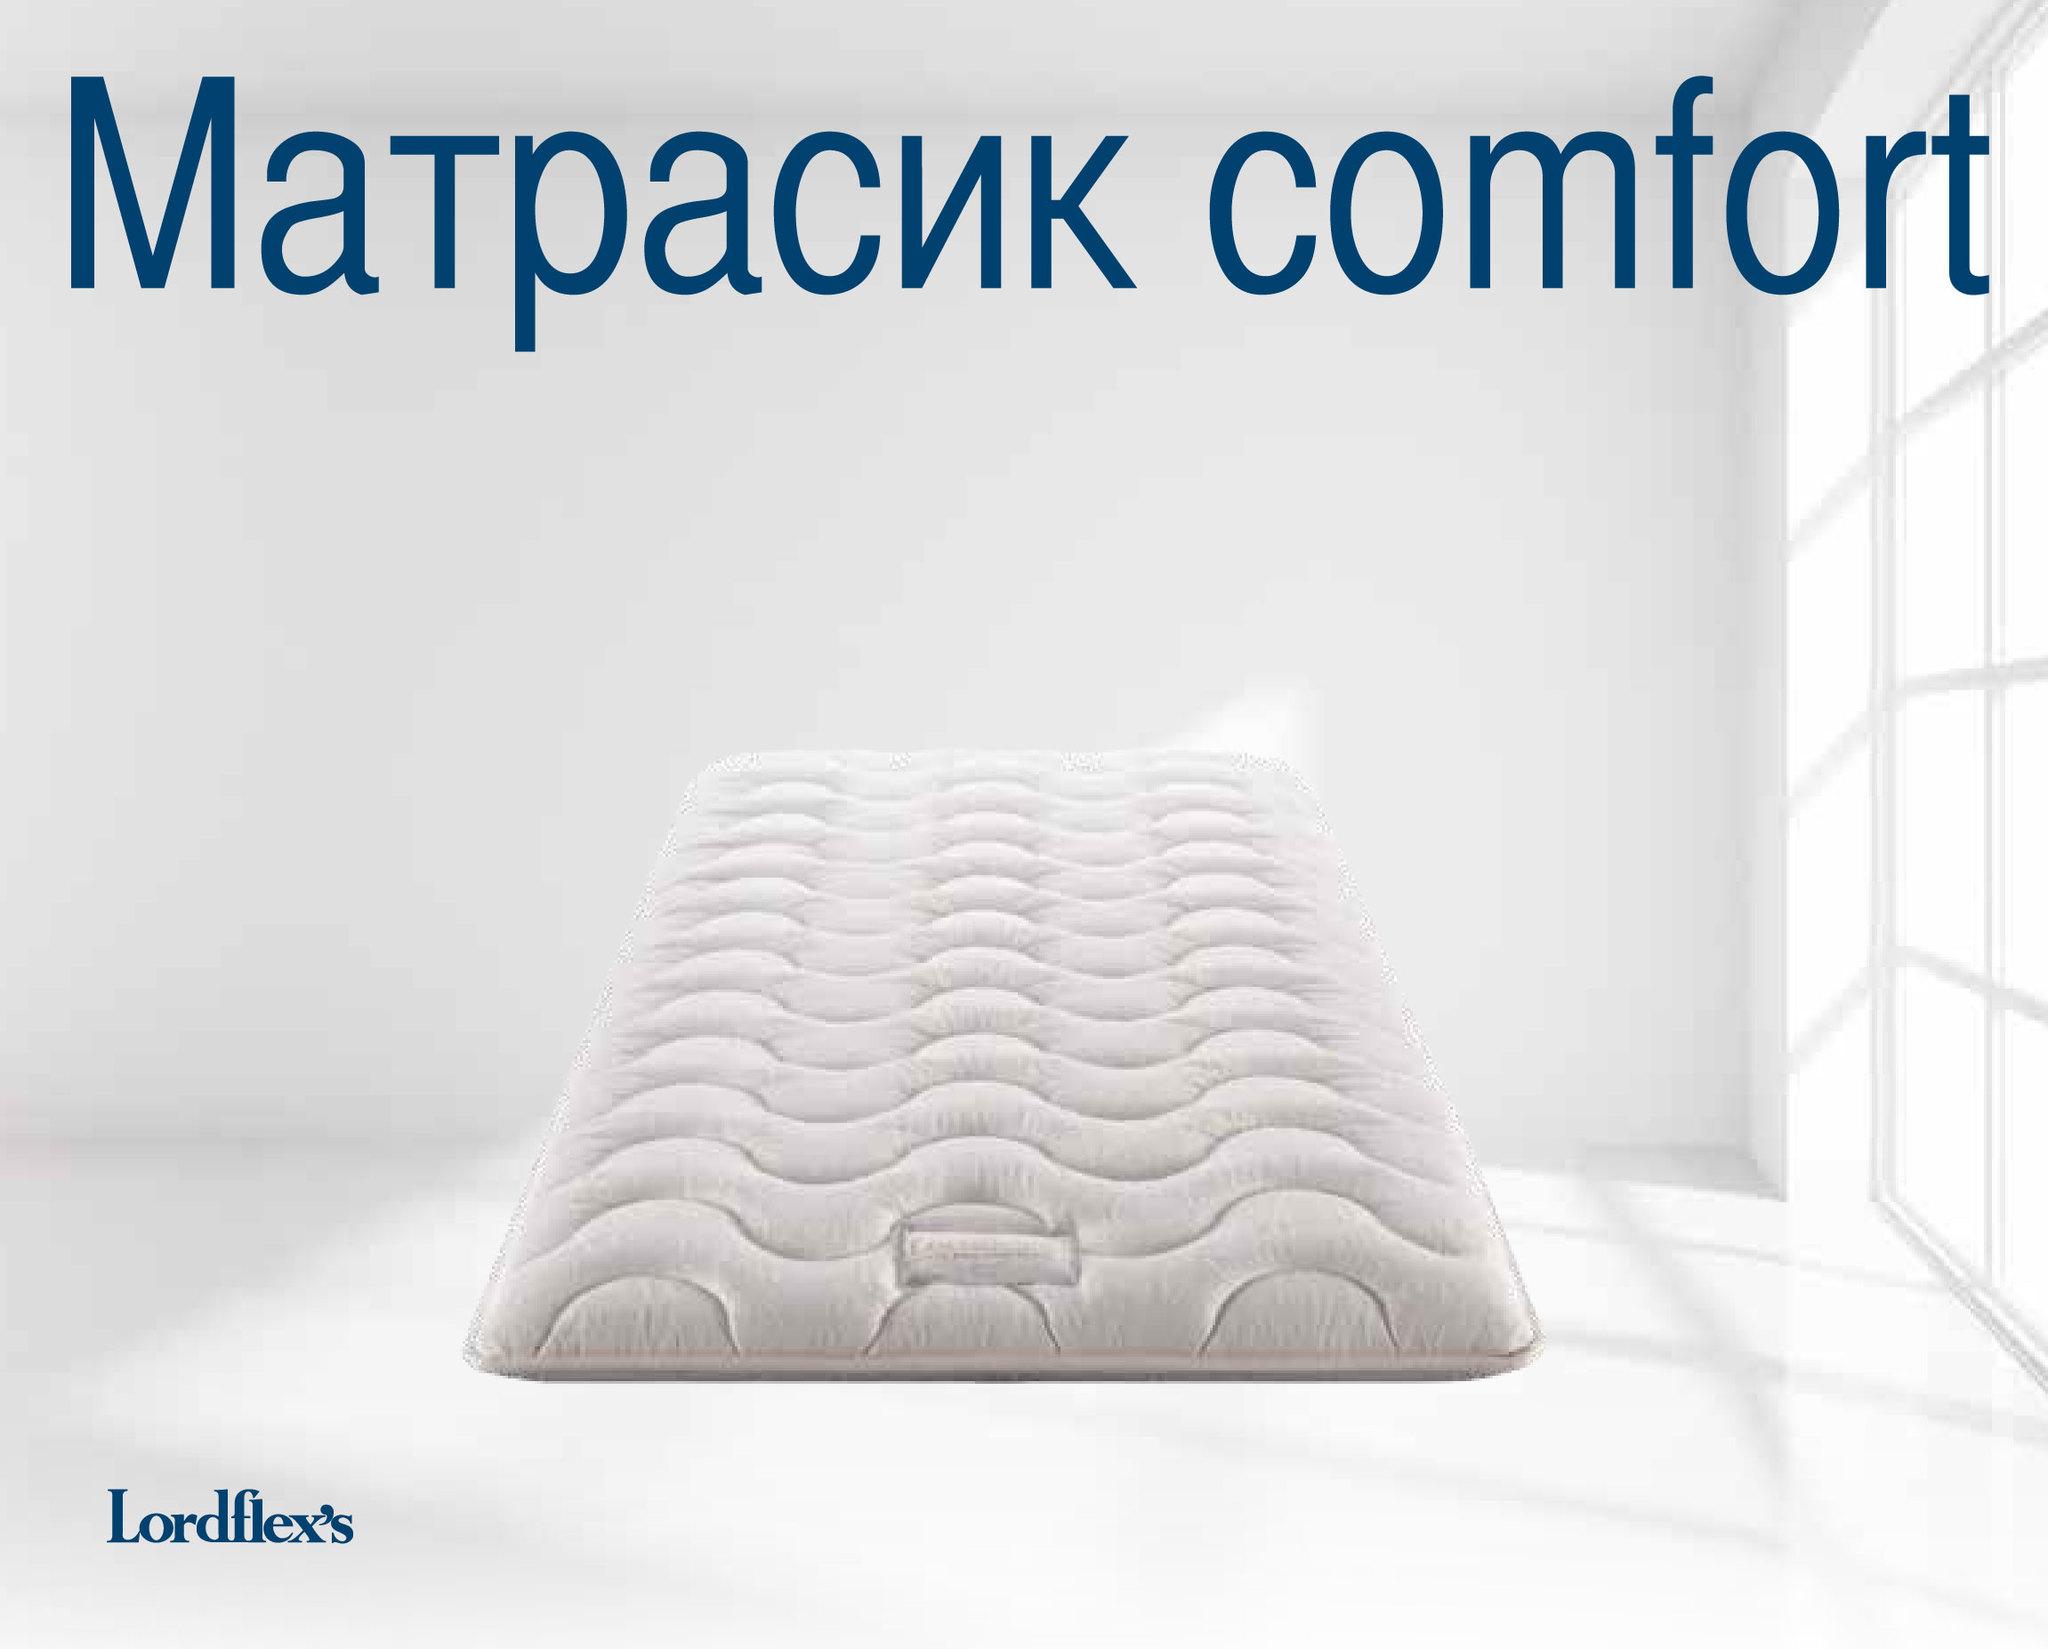 Матрасы Матрасик ортопедический 90х200 Lordflex's Comfort Memory Materassino-Comfort.jpg